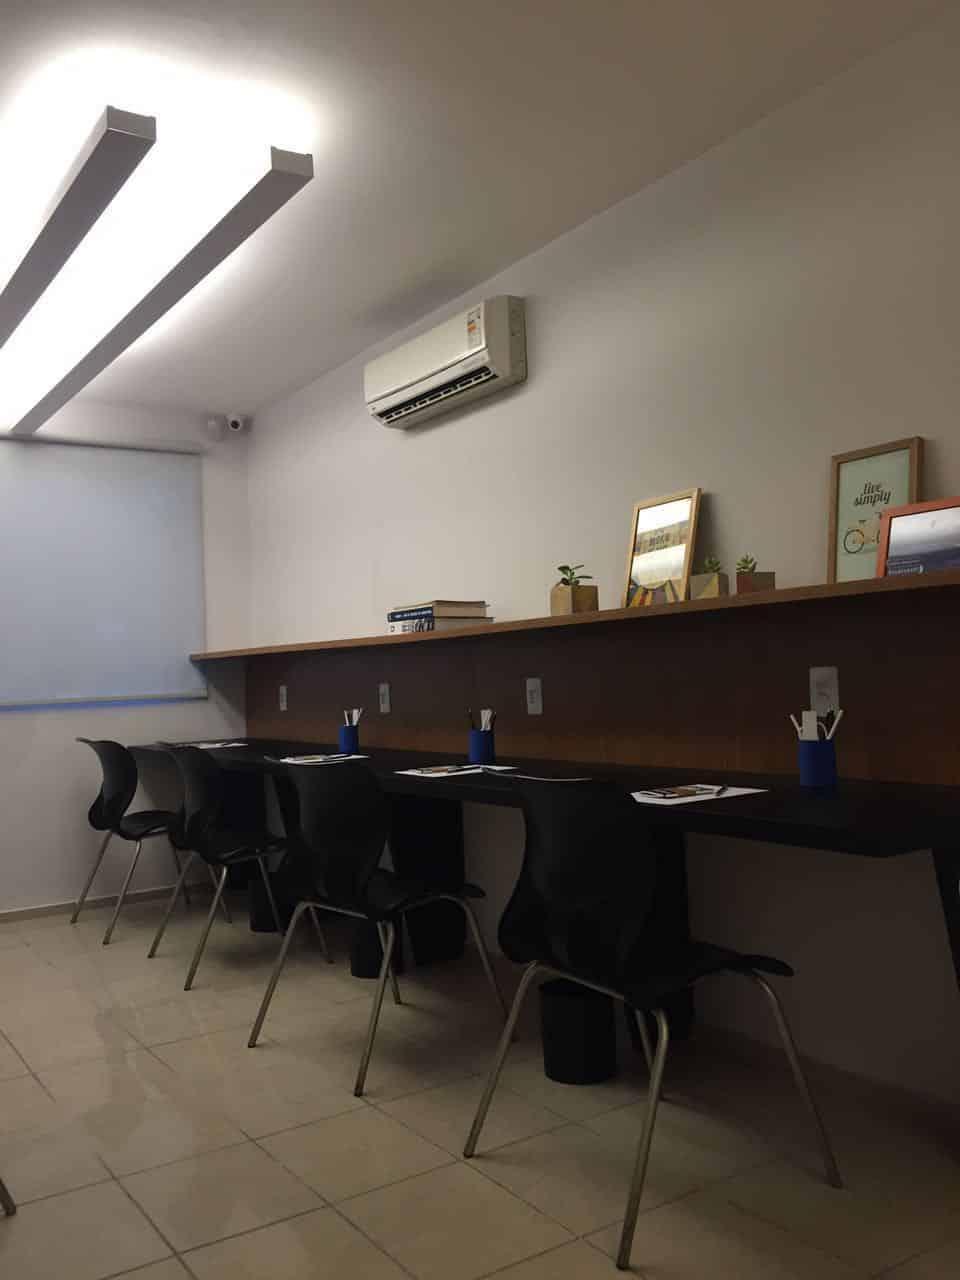 IMG 20160919 WA0026 - Arquitetos ganham coworking exclusivo no Recife